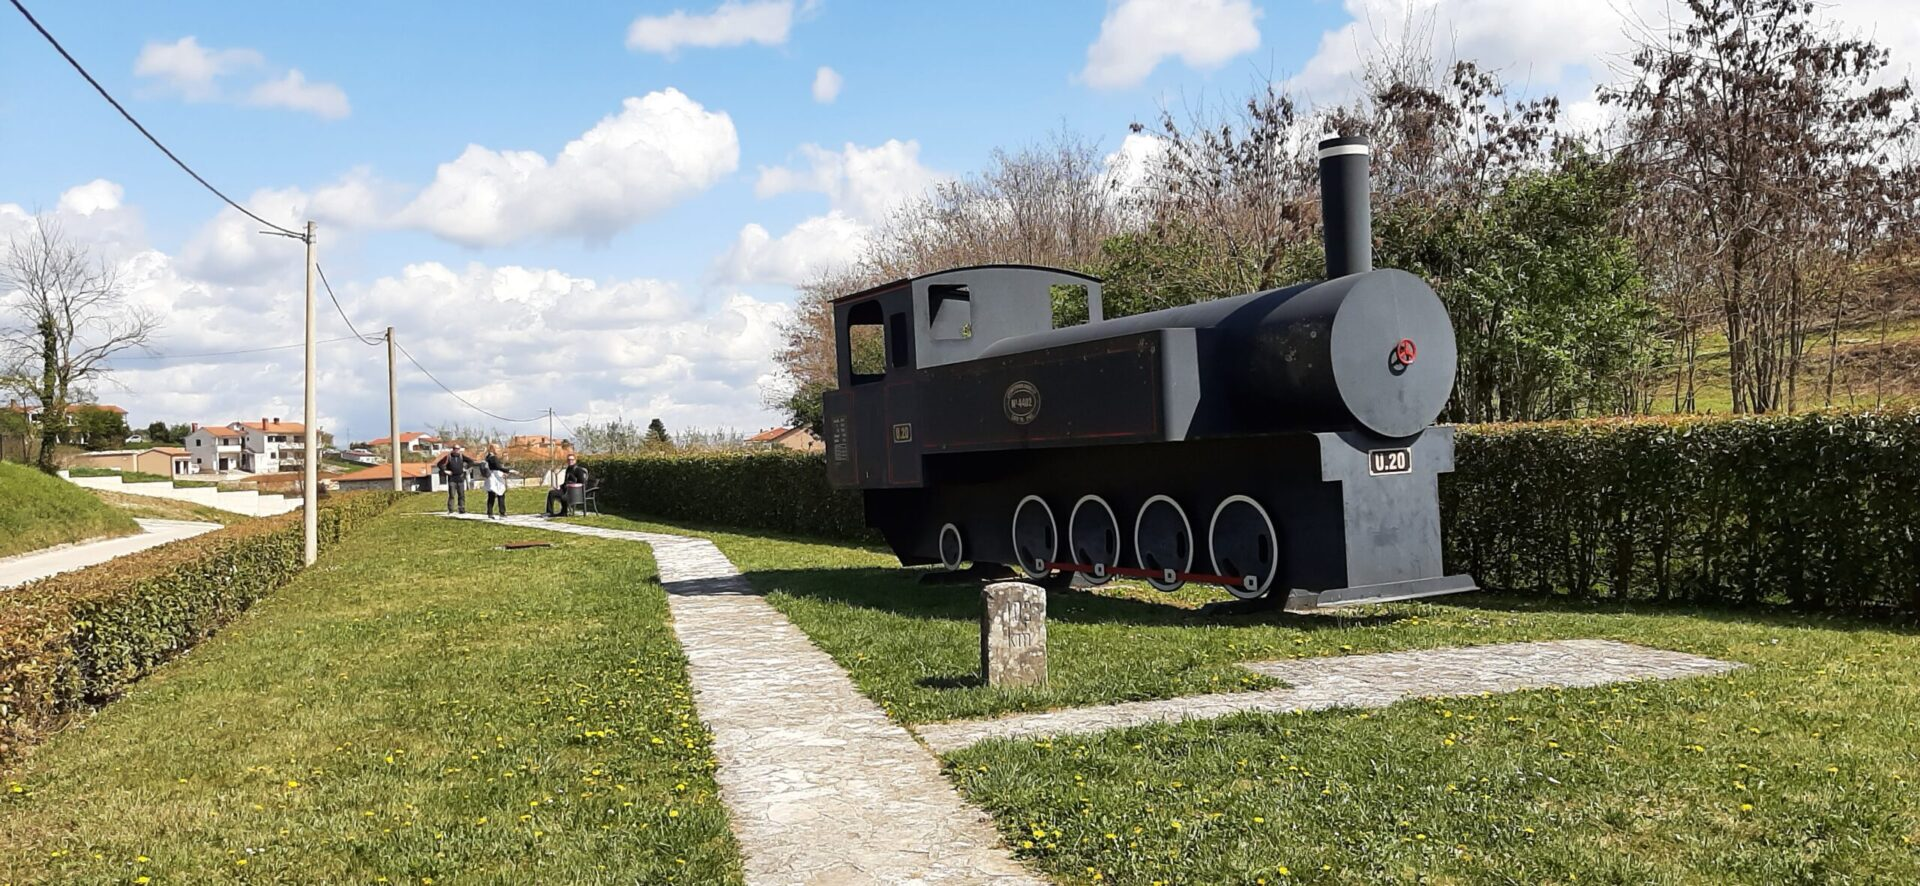 Parenzana - lokomotiva U20